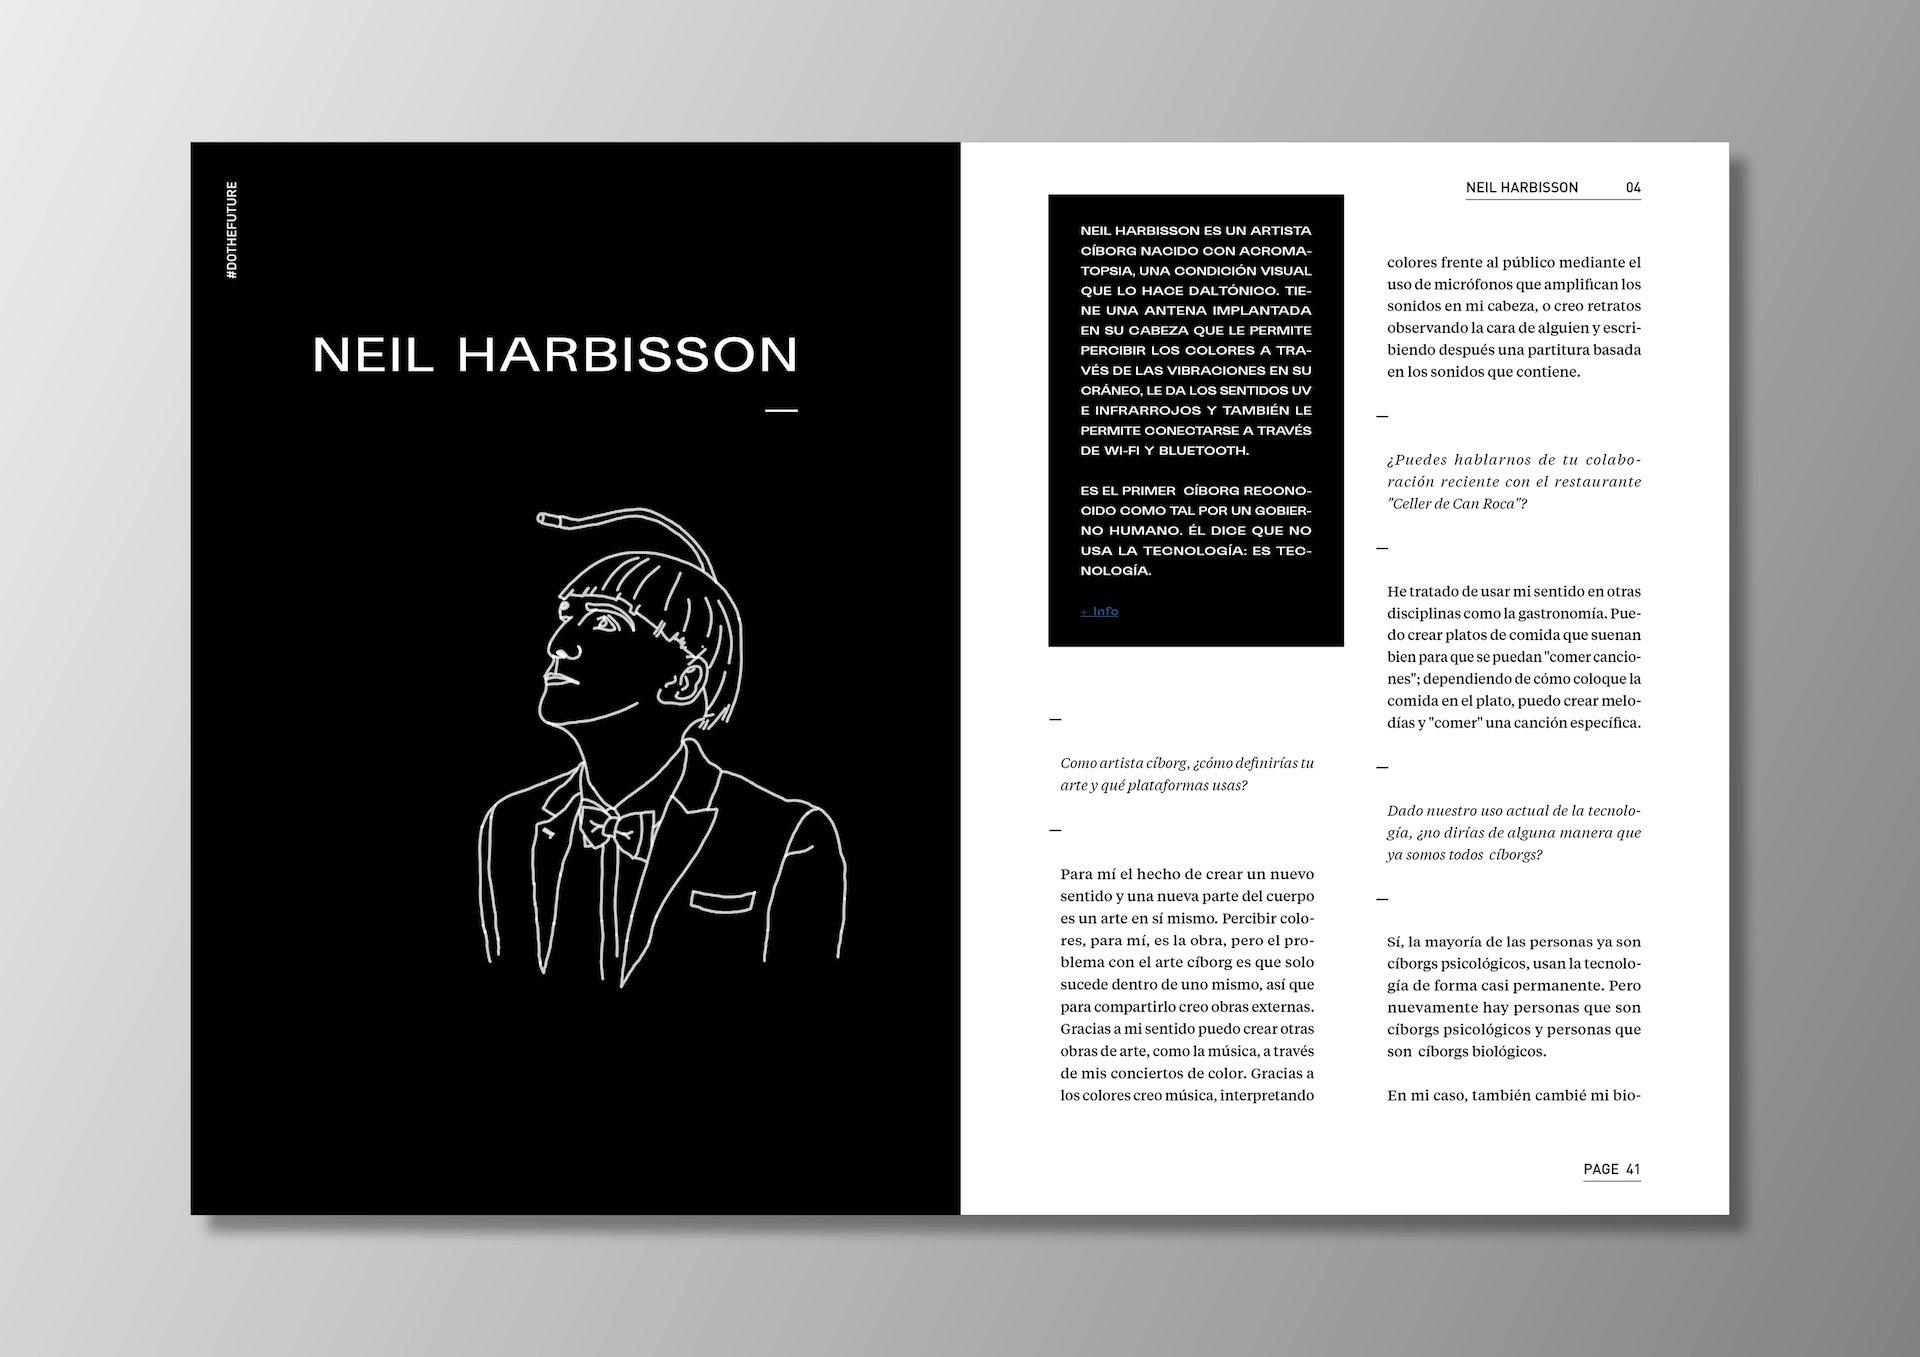 DOTHEFUTURE Neil Harbisson